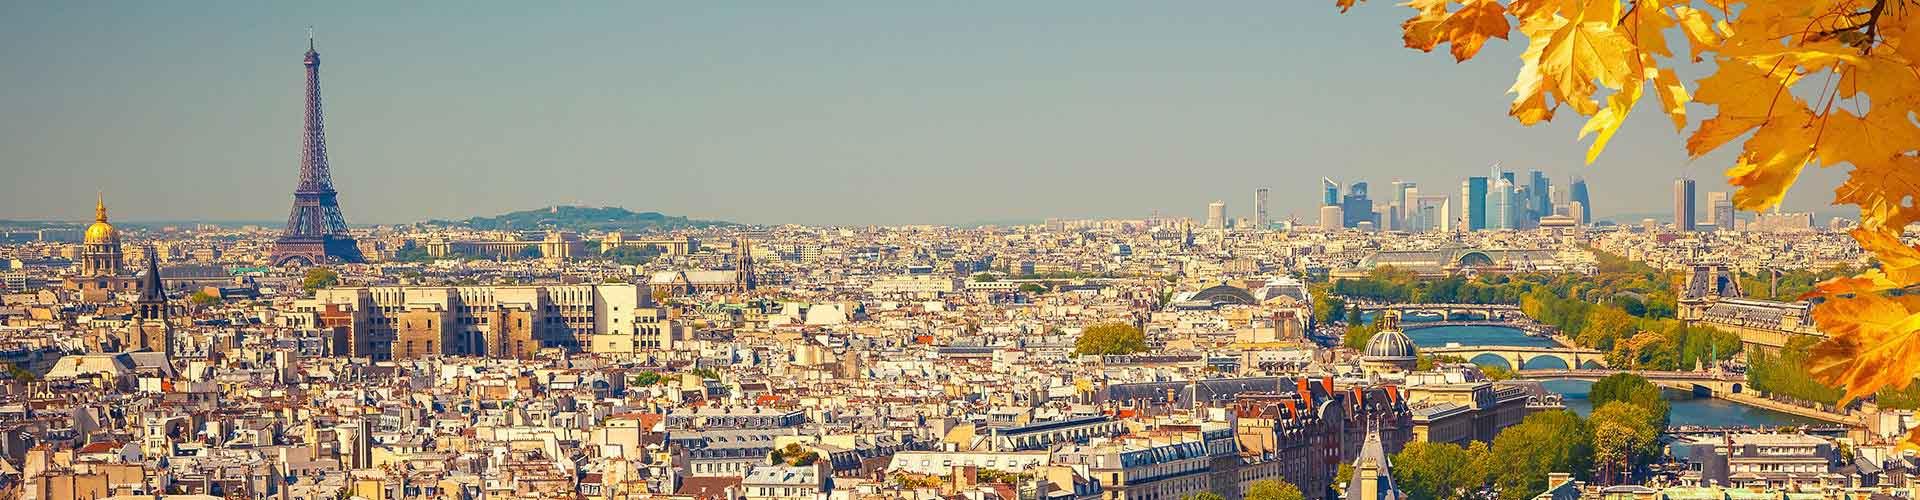 París - Hostales cerca a Bois de Boulogne. Mapas de París, Fotos y comentarios de cada Hostal en París.